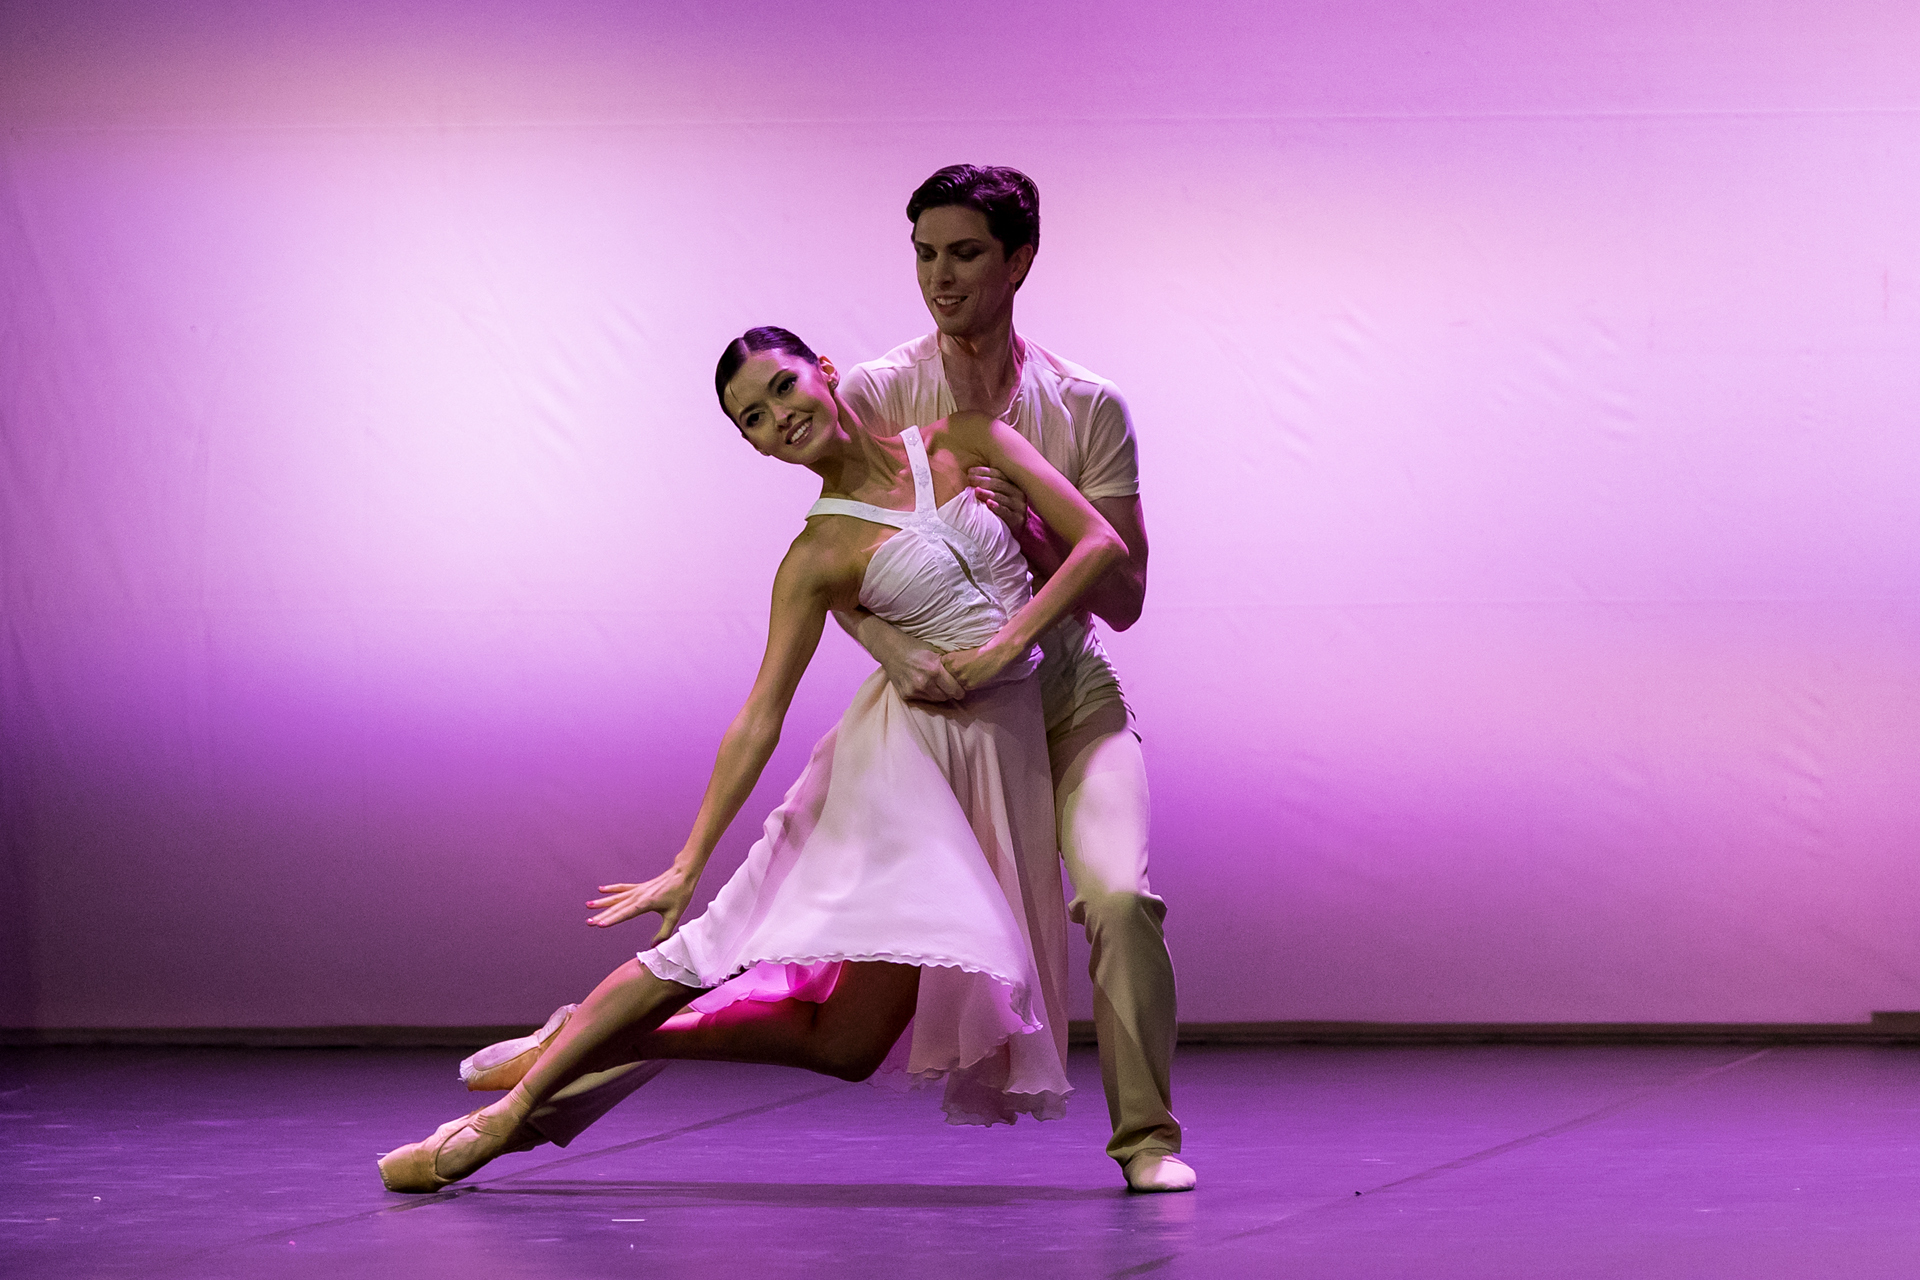 2018_09_09-Astana-Ballet-©LKV-204637-5D4B2069